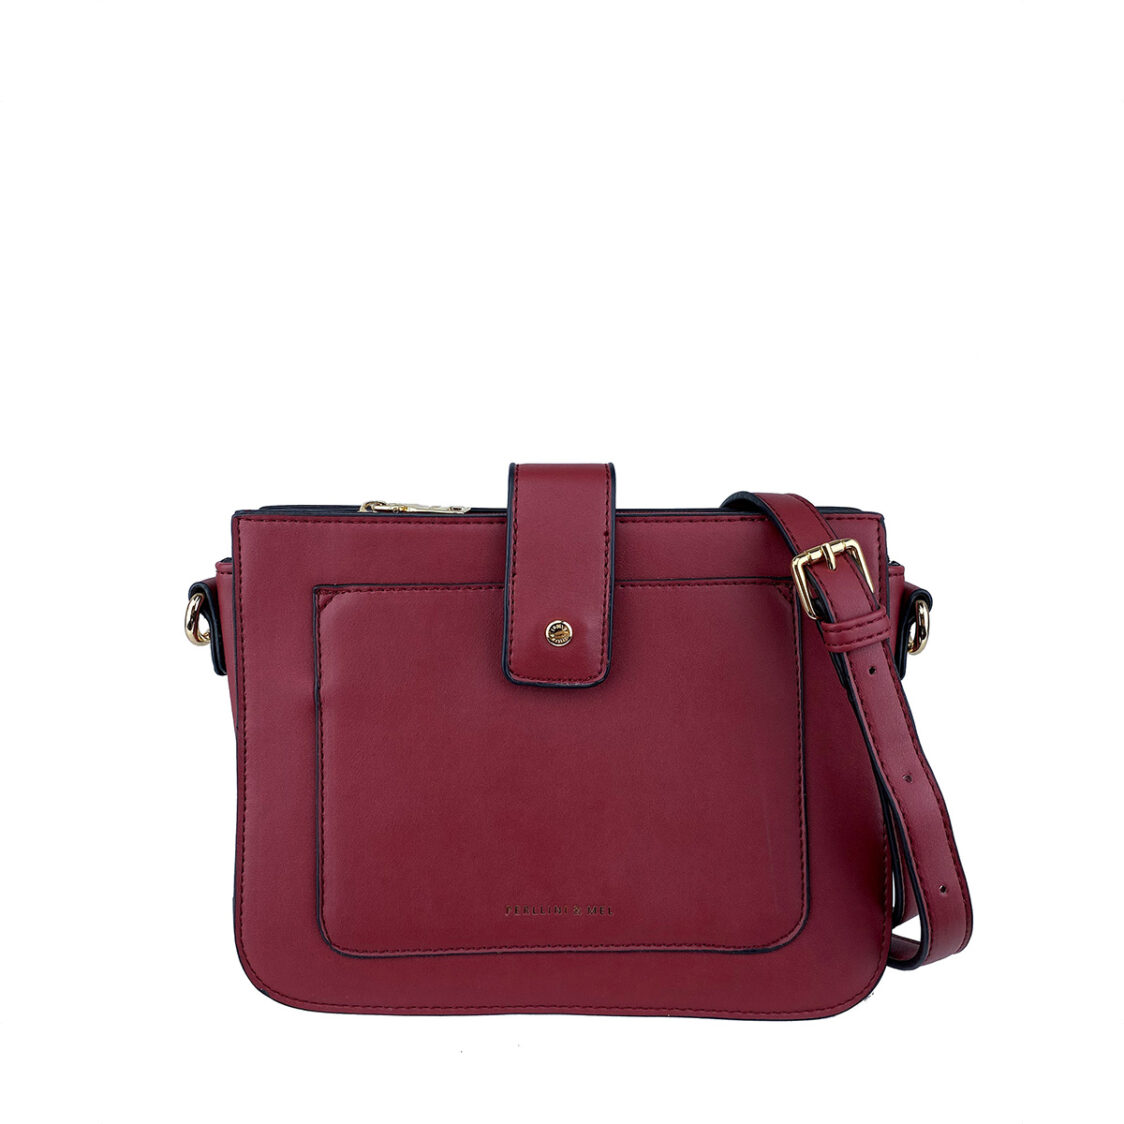 Perllini  Mel Sling Bag With Front Slot Pocket Dark Red PF3701-Dk R